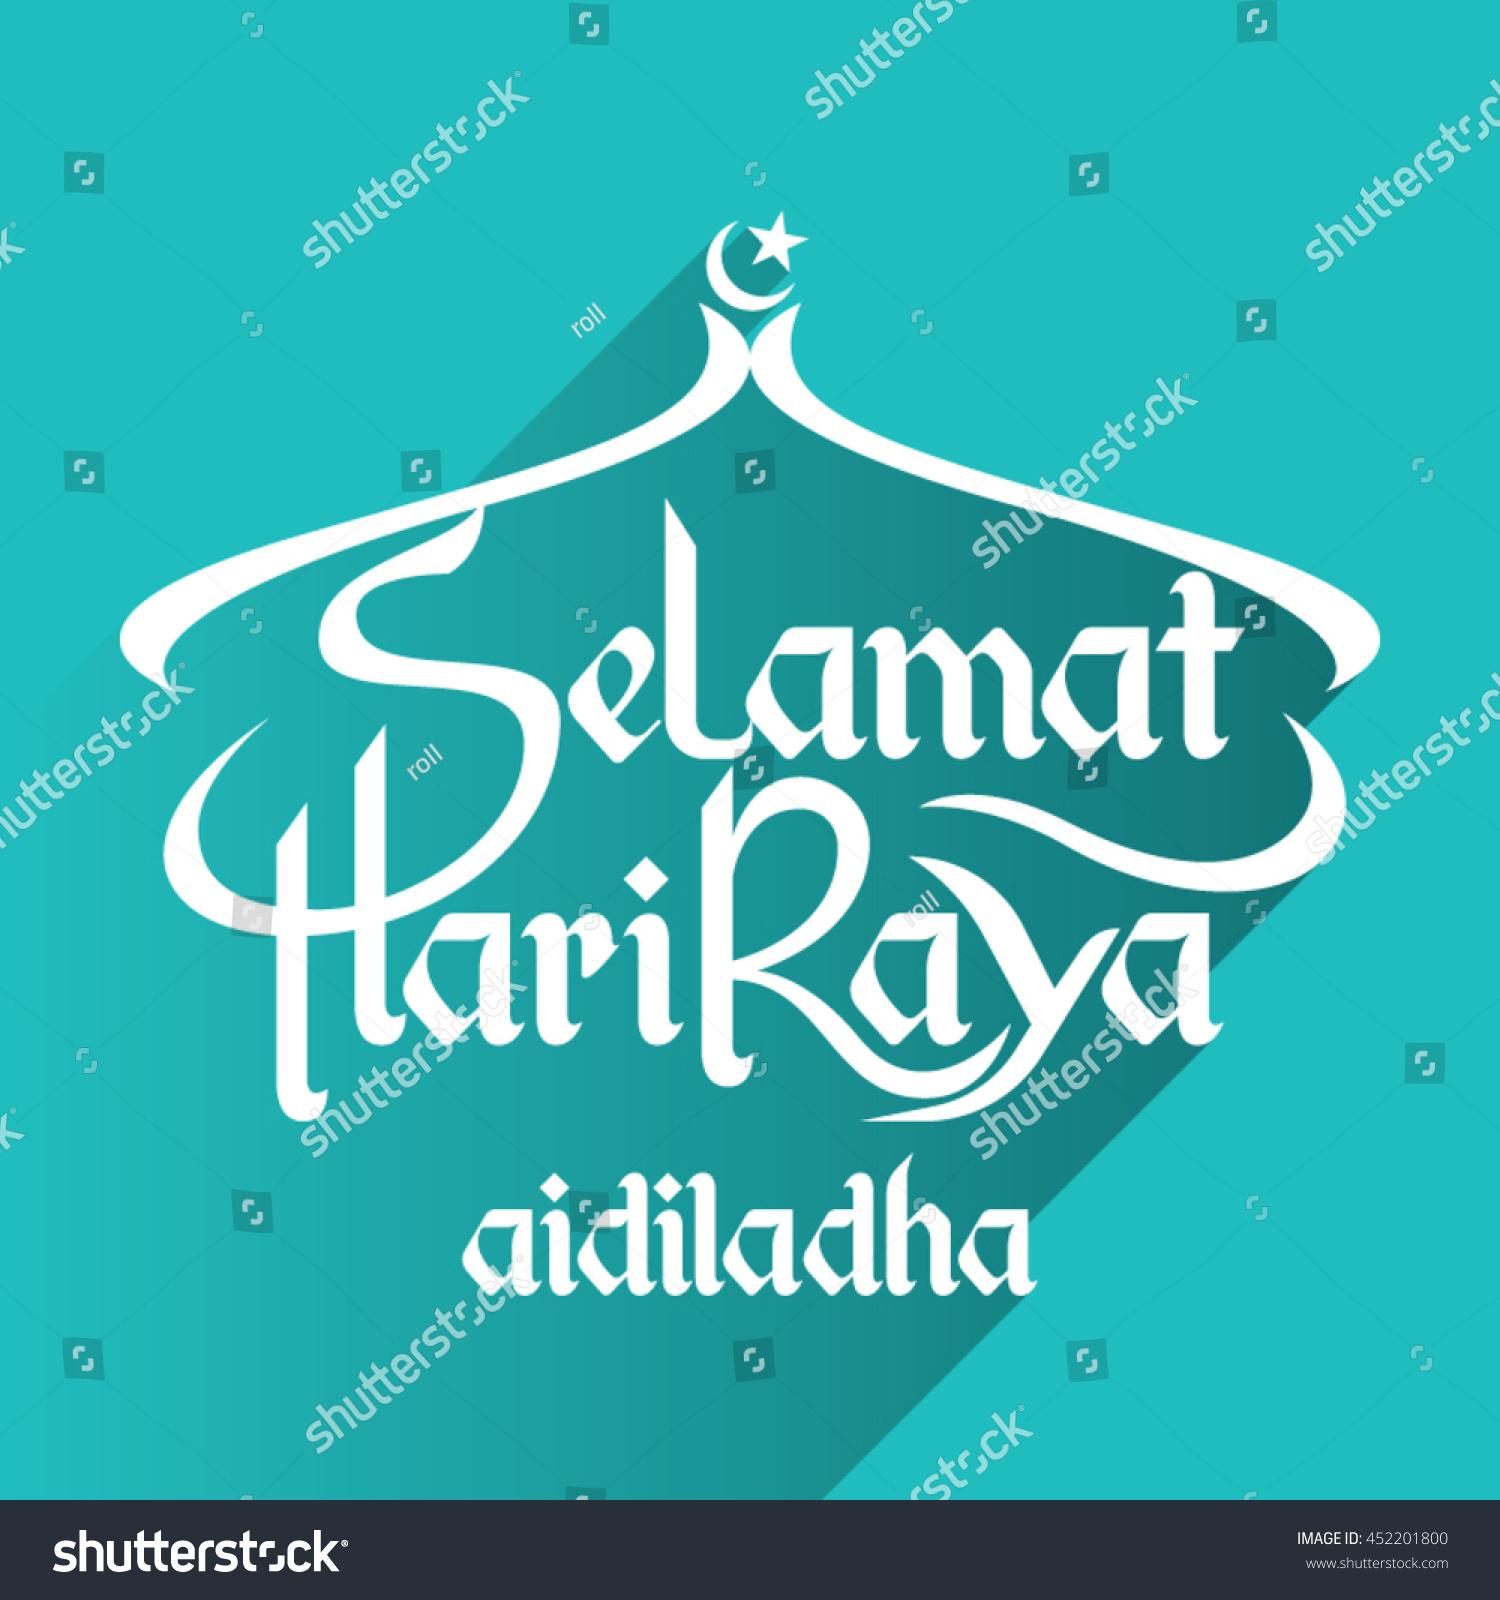 Selamat Hari Raya Aidiladha Known Arabic Stock Vector Royalty Free 452201800